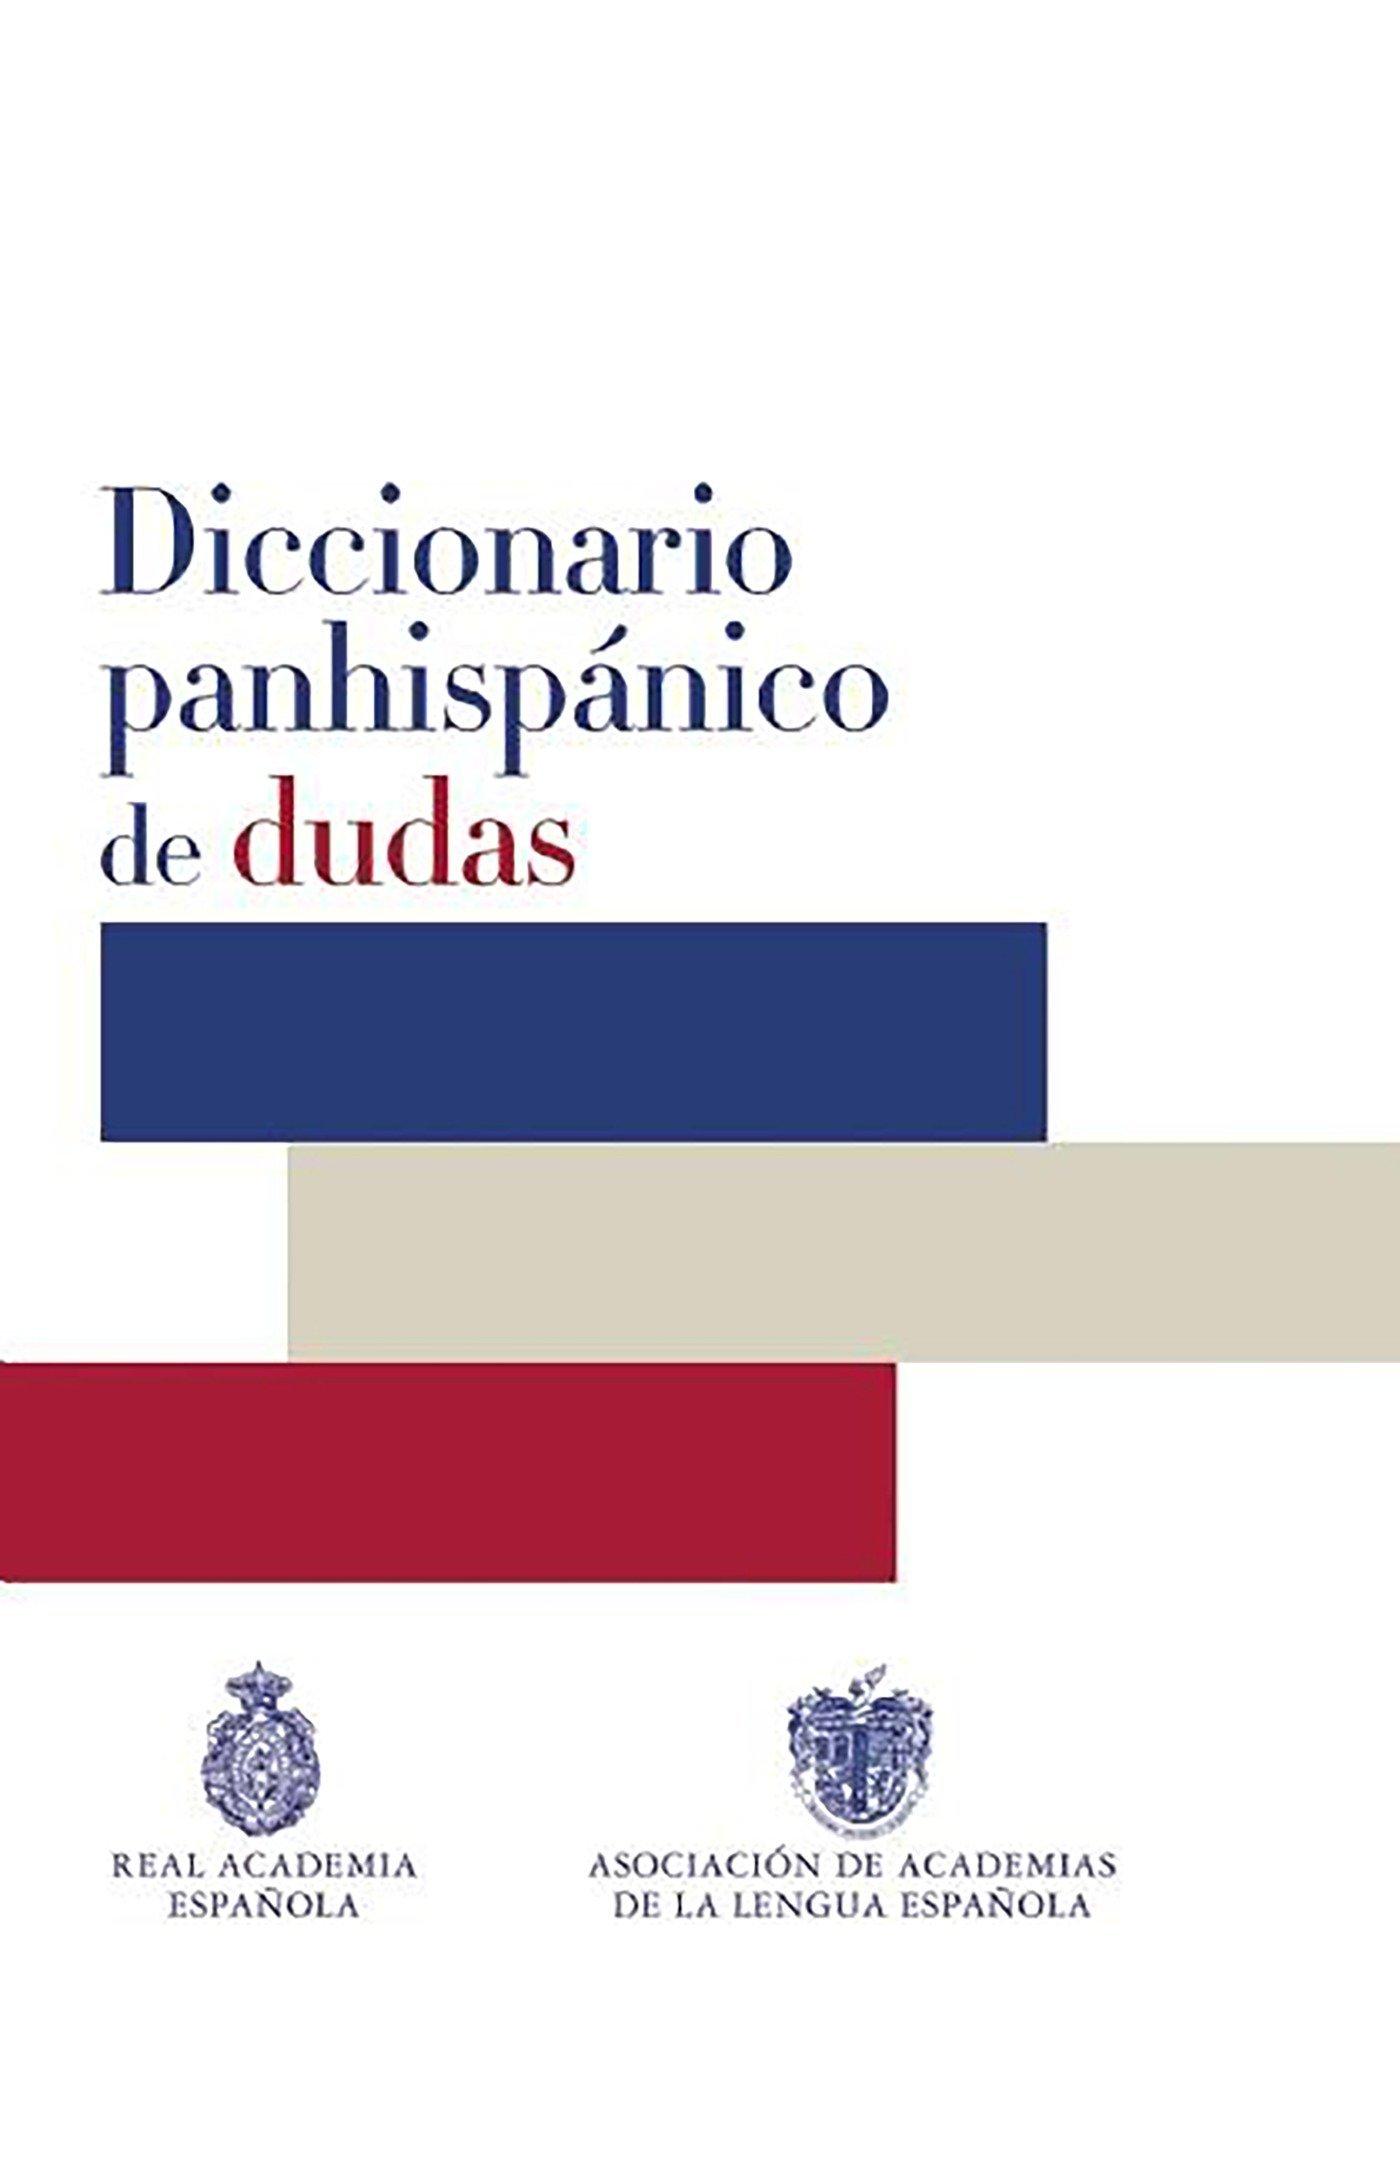 Diccionario panhispanico de dudas / Panhispanic Dictionary of Doubts (Real Academia de la Lengua Española) (Spanish Edition) (Spanish) Hardcover – October 13, 2015 Taurus 8430617507 Dictionaries Espaanol - Errores de uso